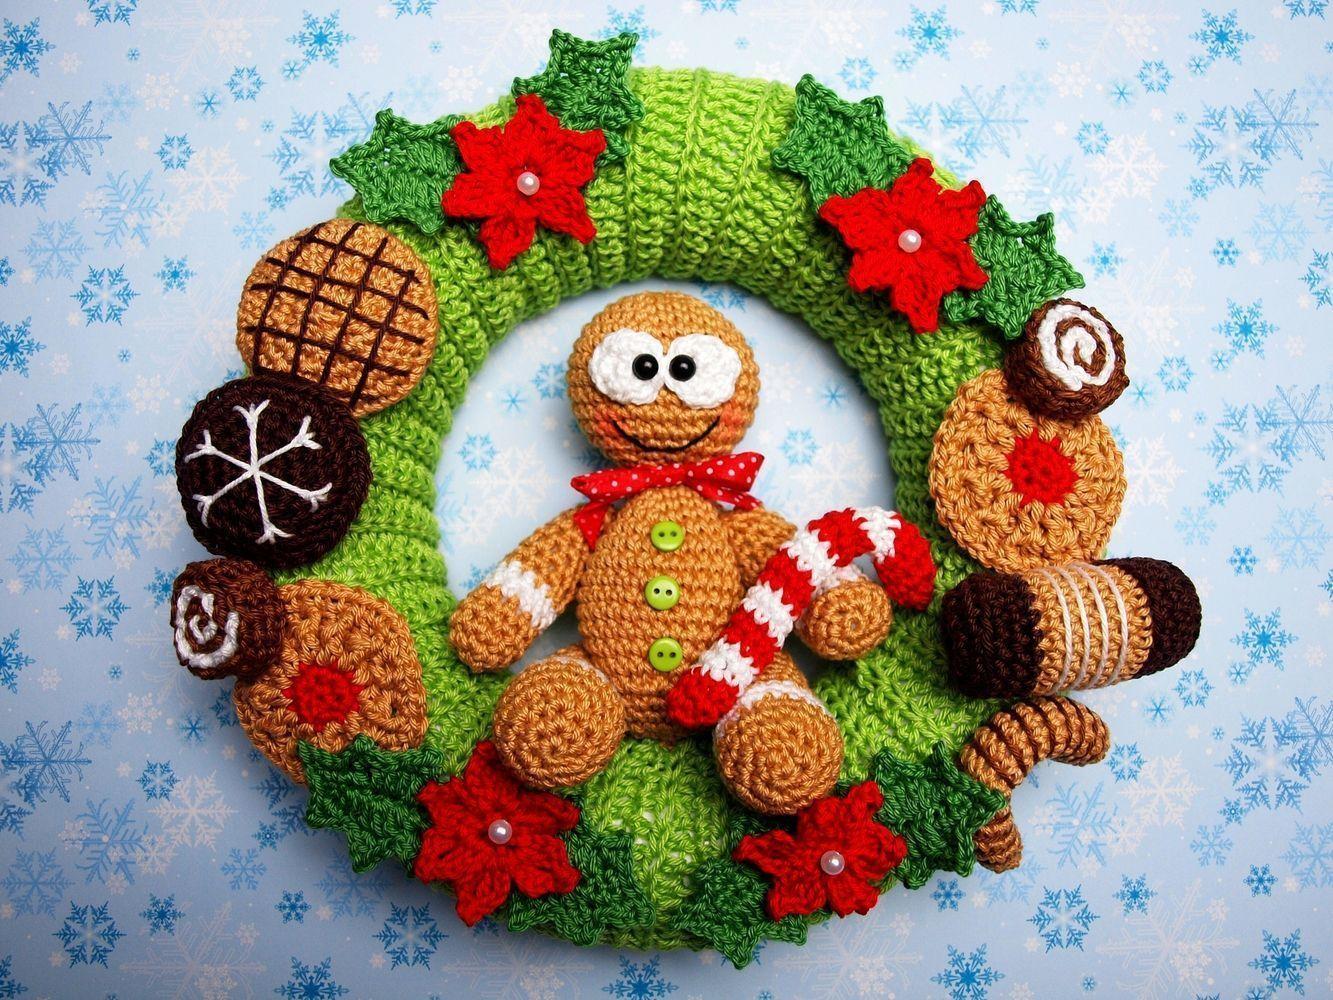 Photo of #knitting ideas christmas crochet pattern door wreath #knitting ideas christmas …, # crochet pattern …